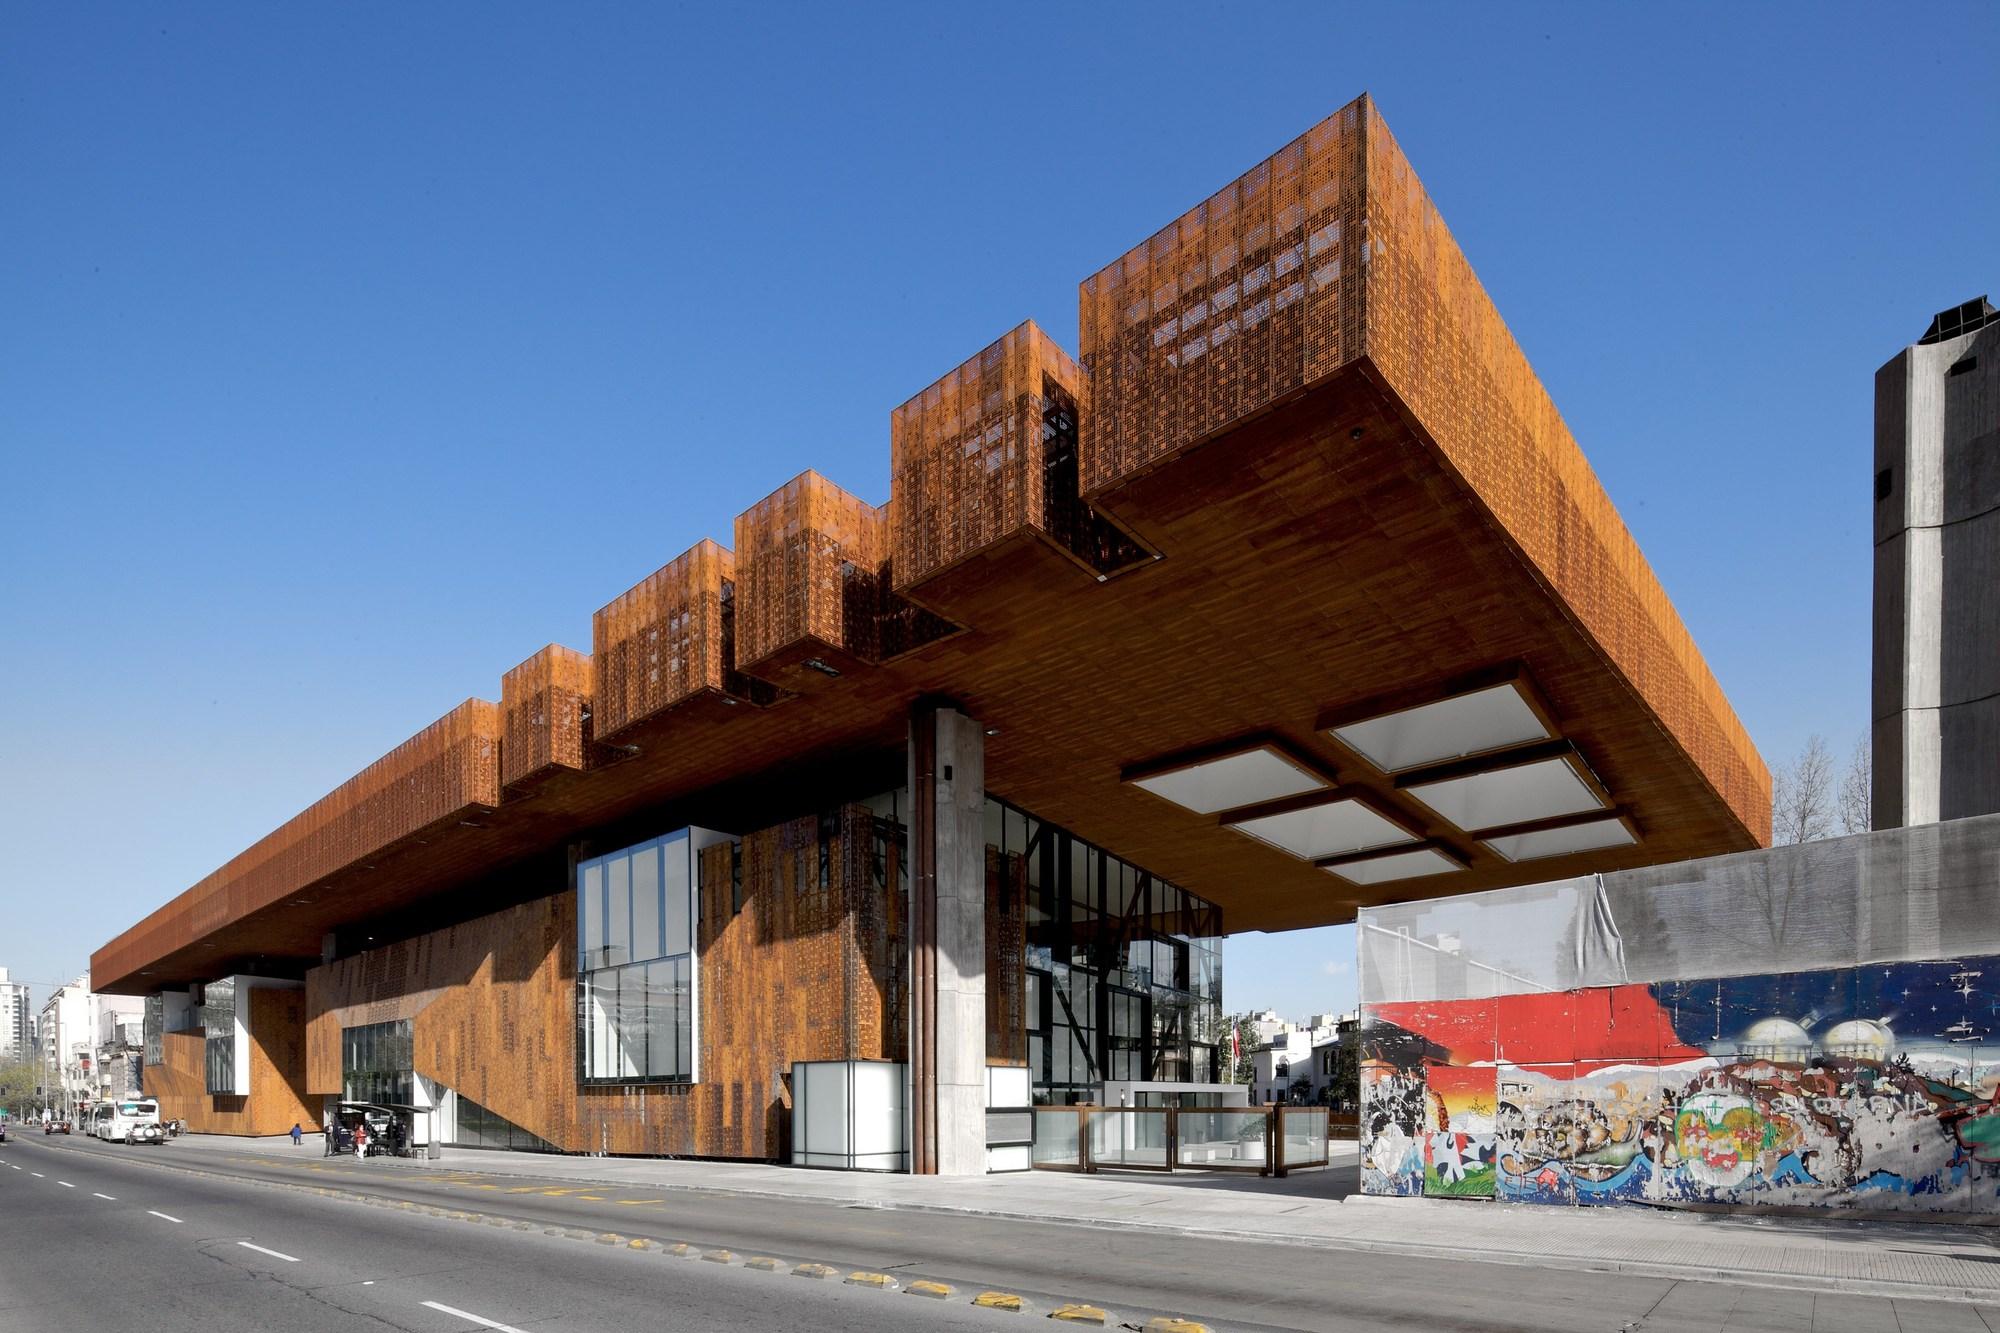 Centro cultural gabriela mistral cristi n fern ndez for Plataforma arquitectura